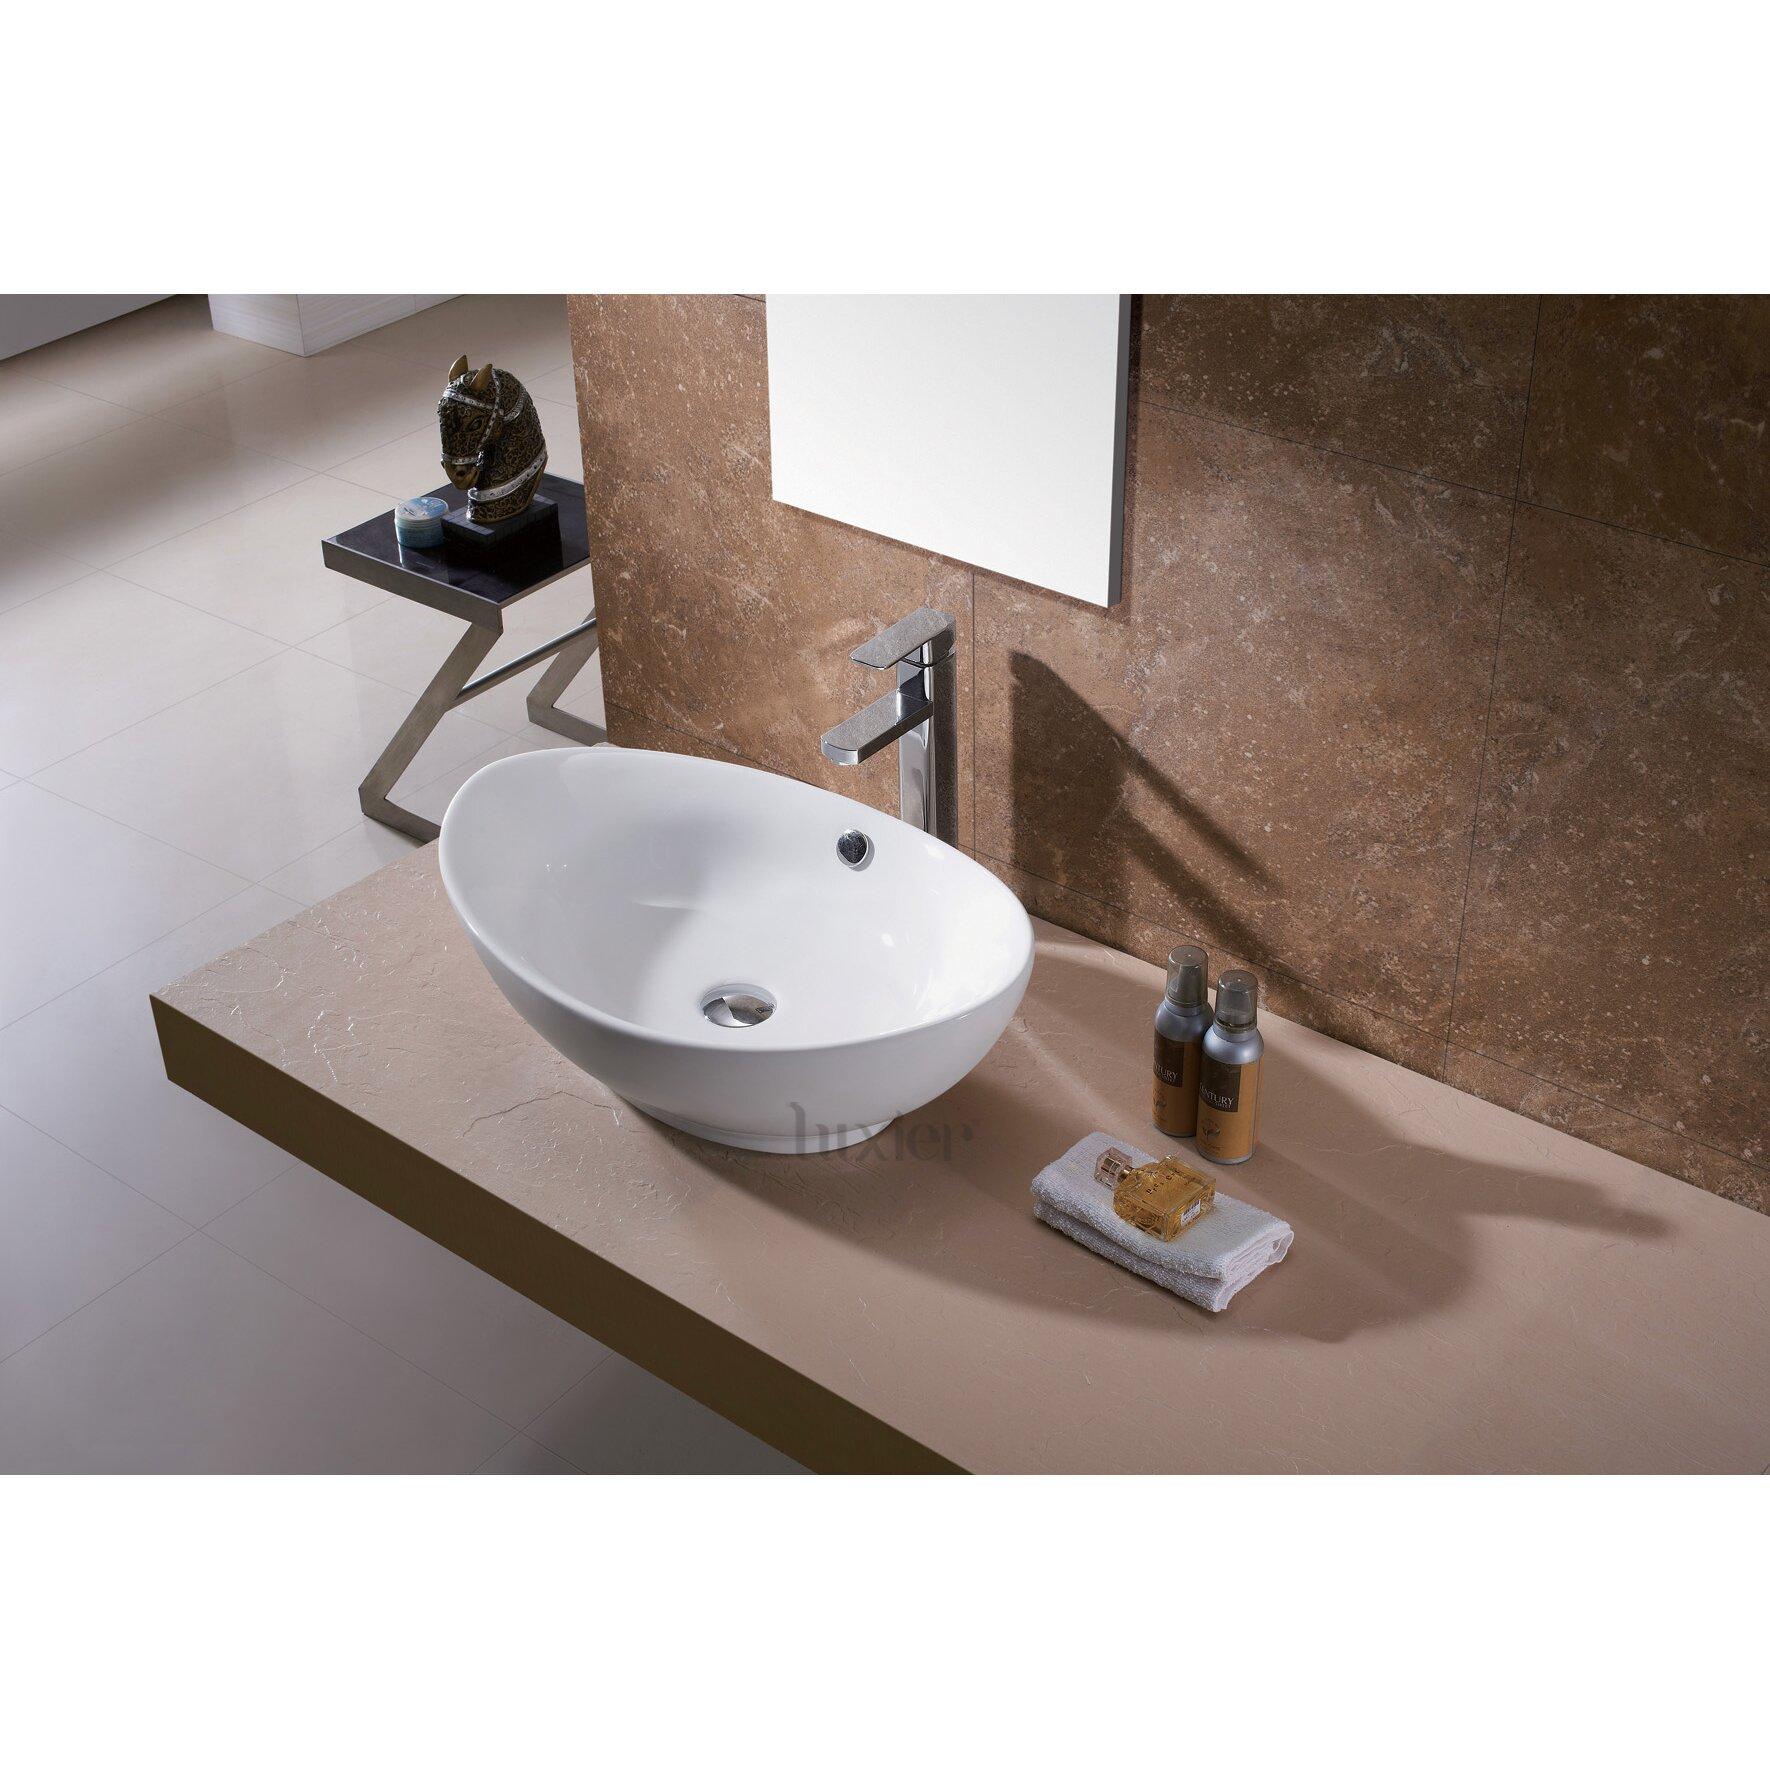 Ceramic Bathroom Basin : 004 Bathroom Egg Porcelain Ceramic Vessel Vanity Sink Art Basin by ...